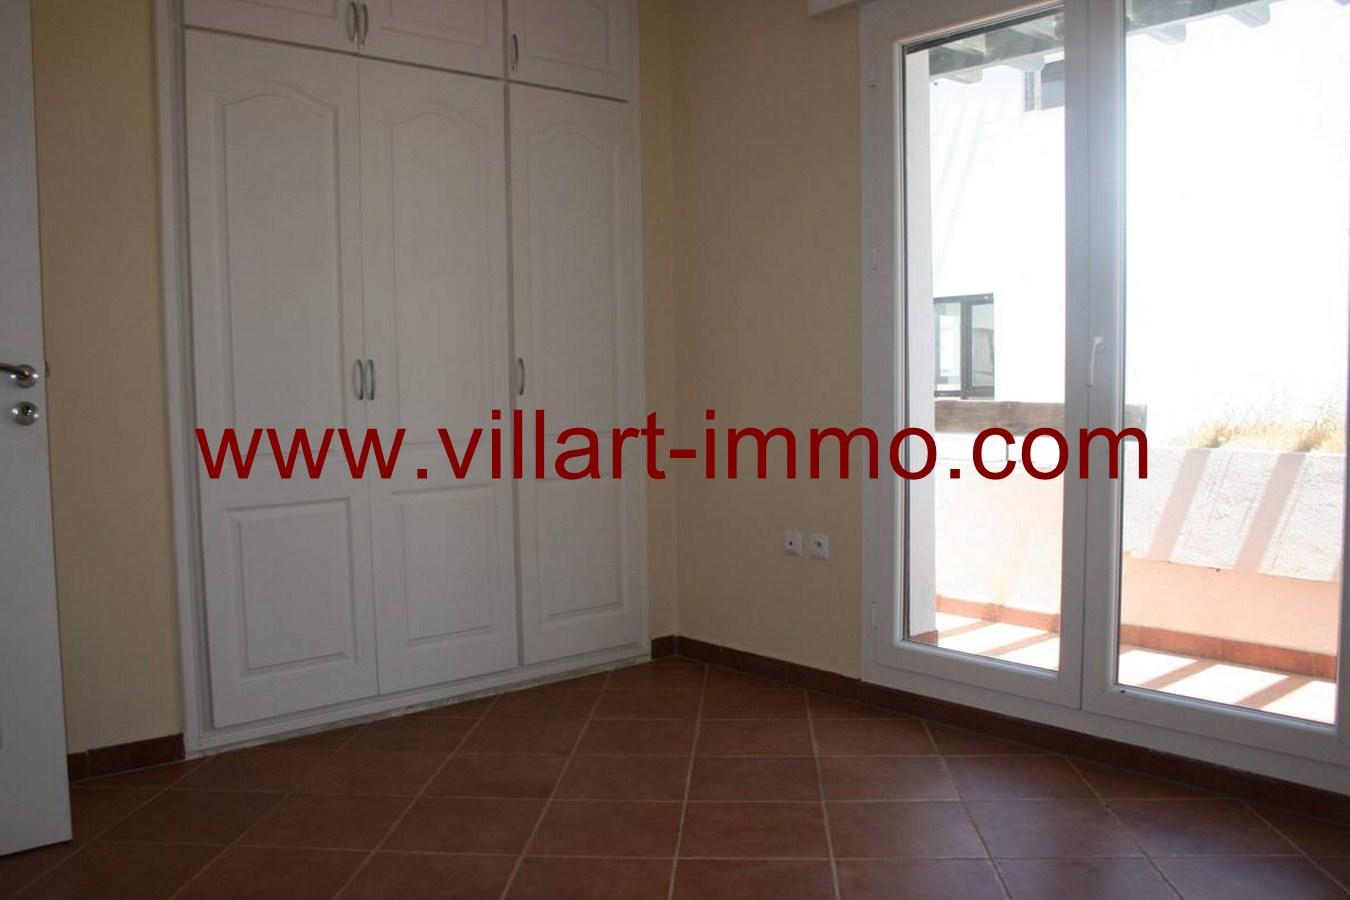 3-vente-appartement-tanger-malabata-chambre-1-va453-villart-immo